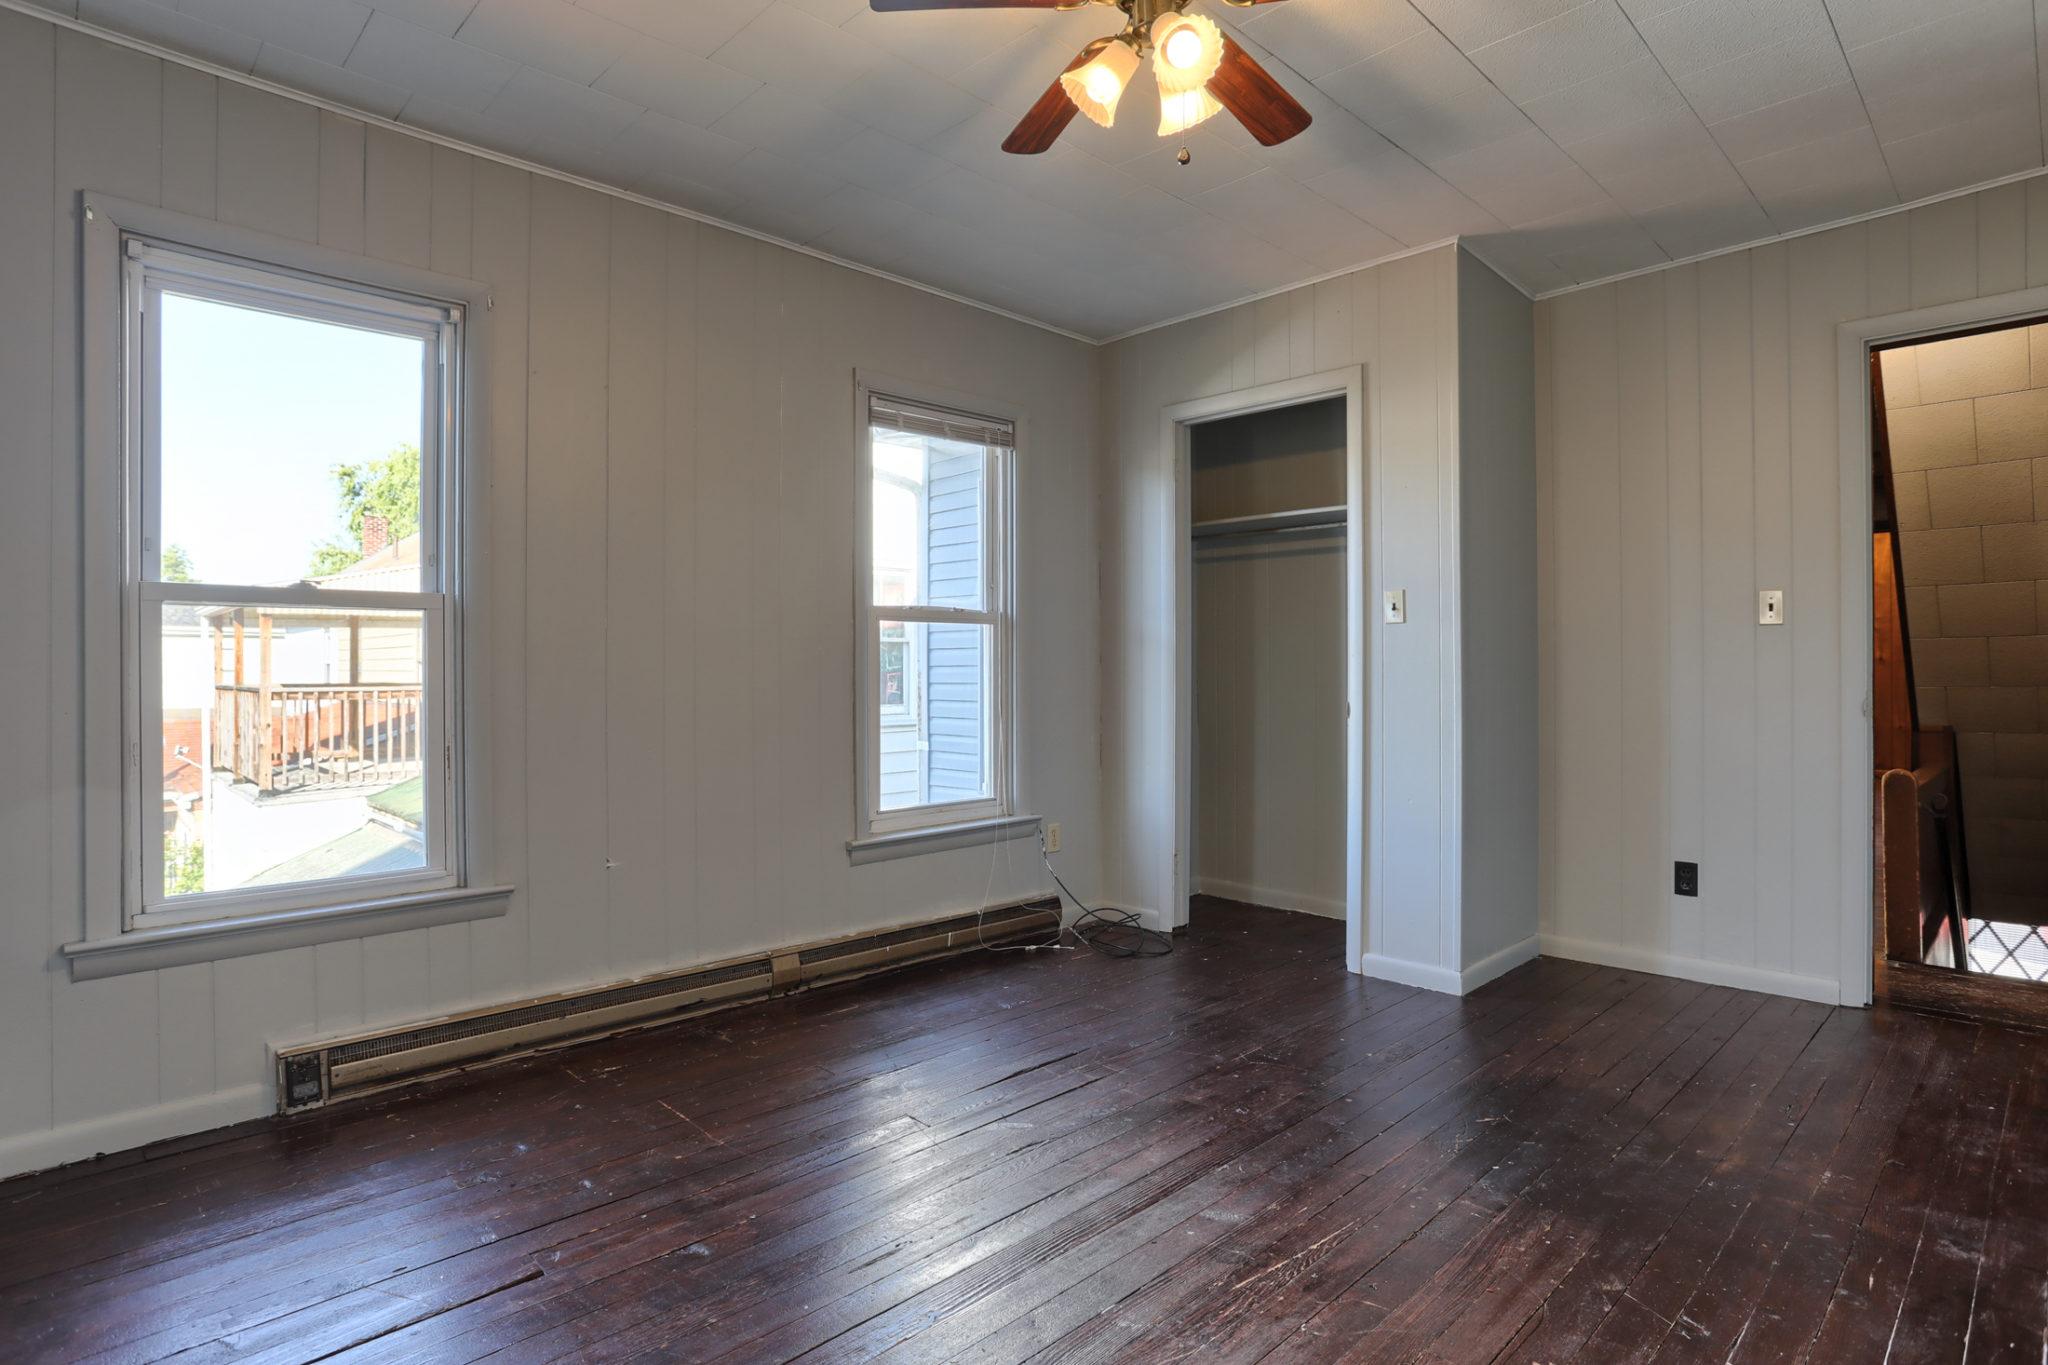 12 E. Maple Avenue - Bedroom 1 (inside view)